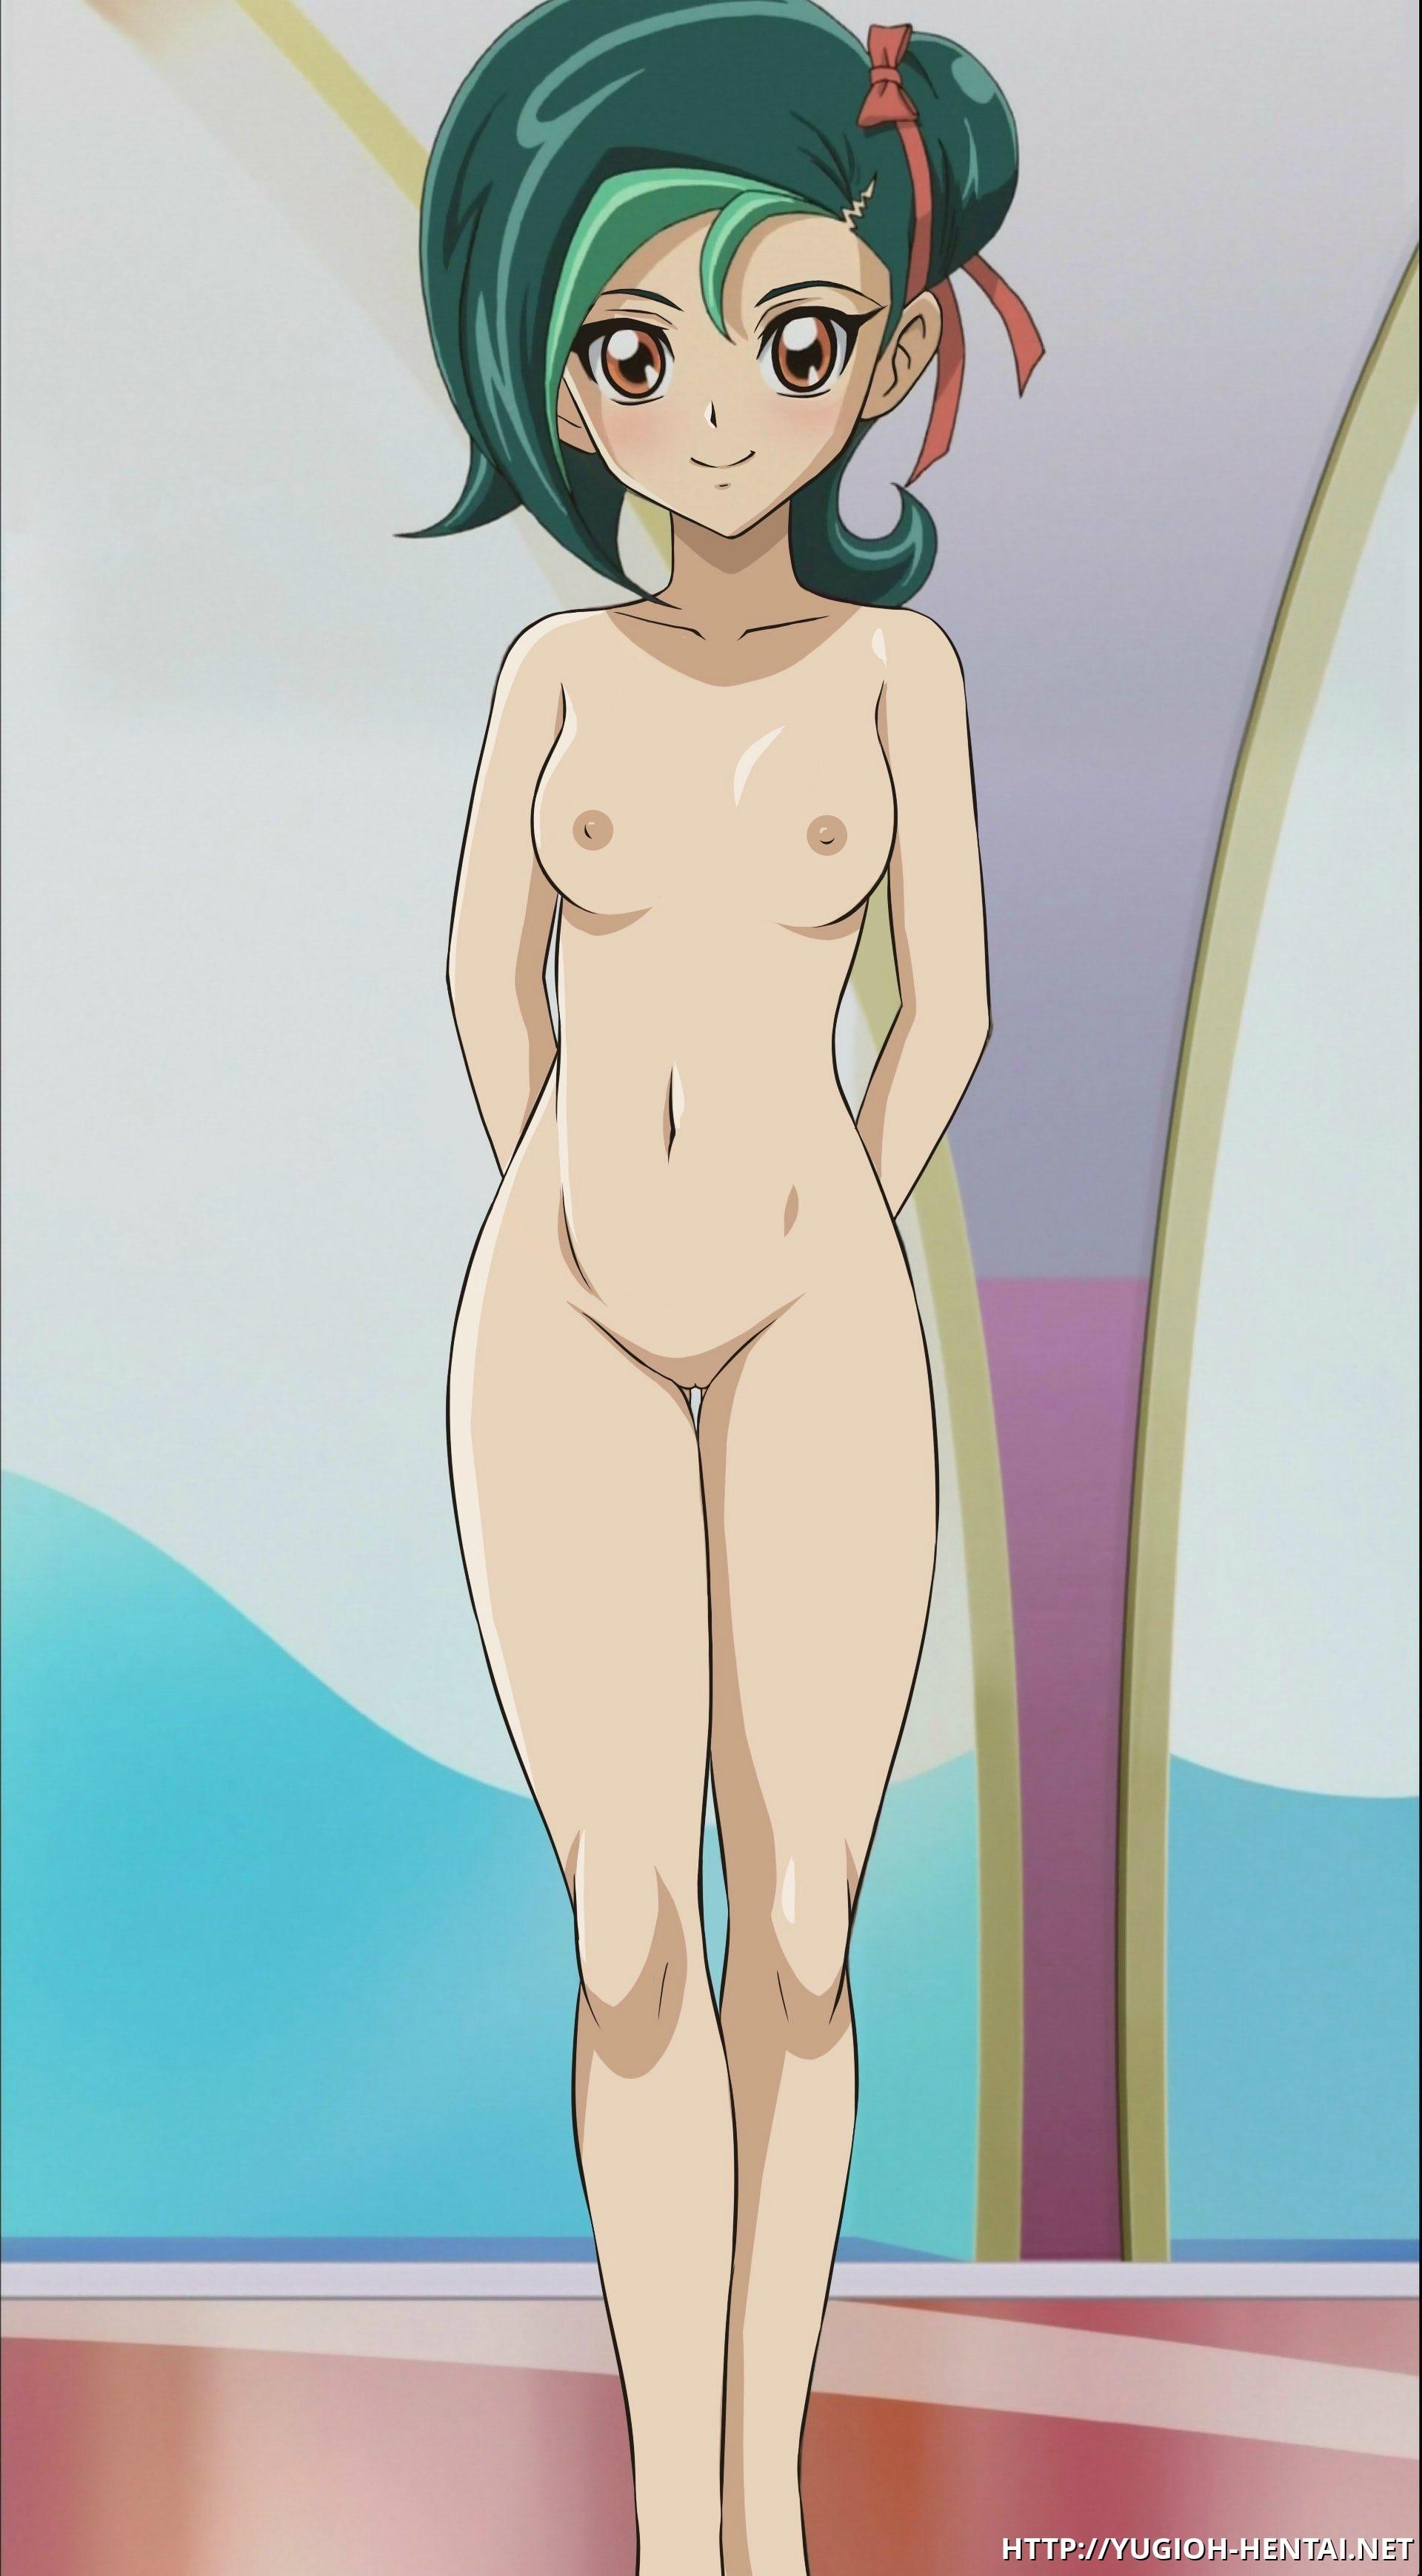 Kotori Mizuki shows her pretty body